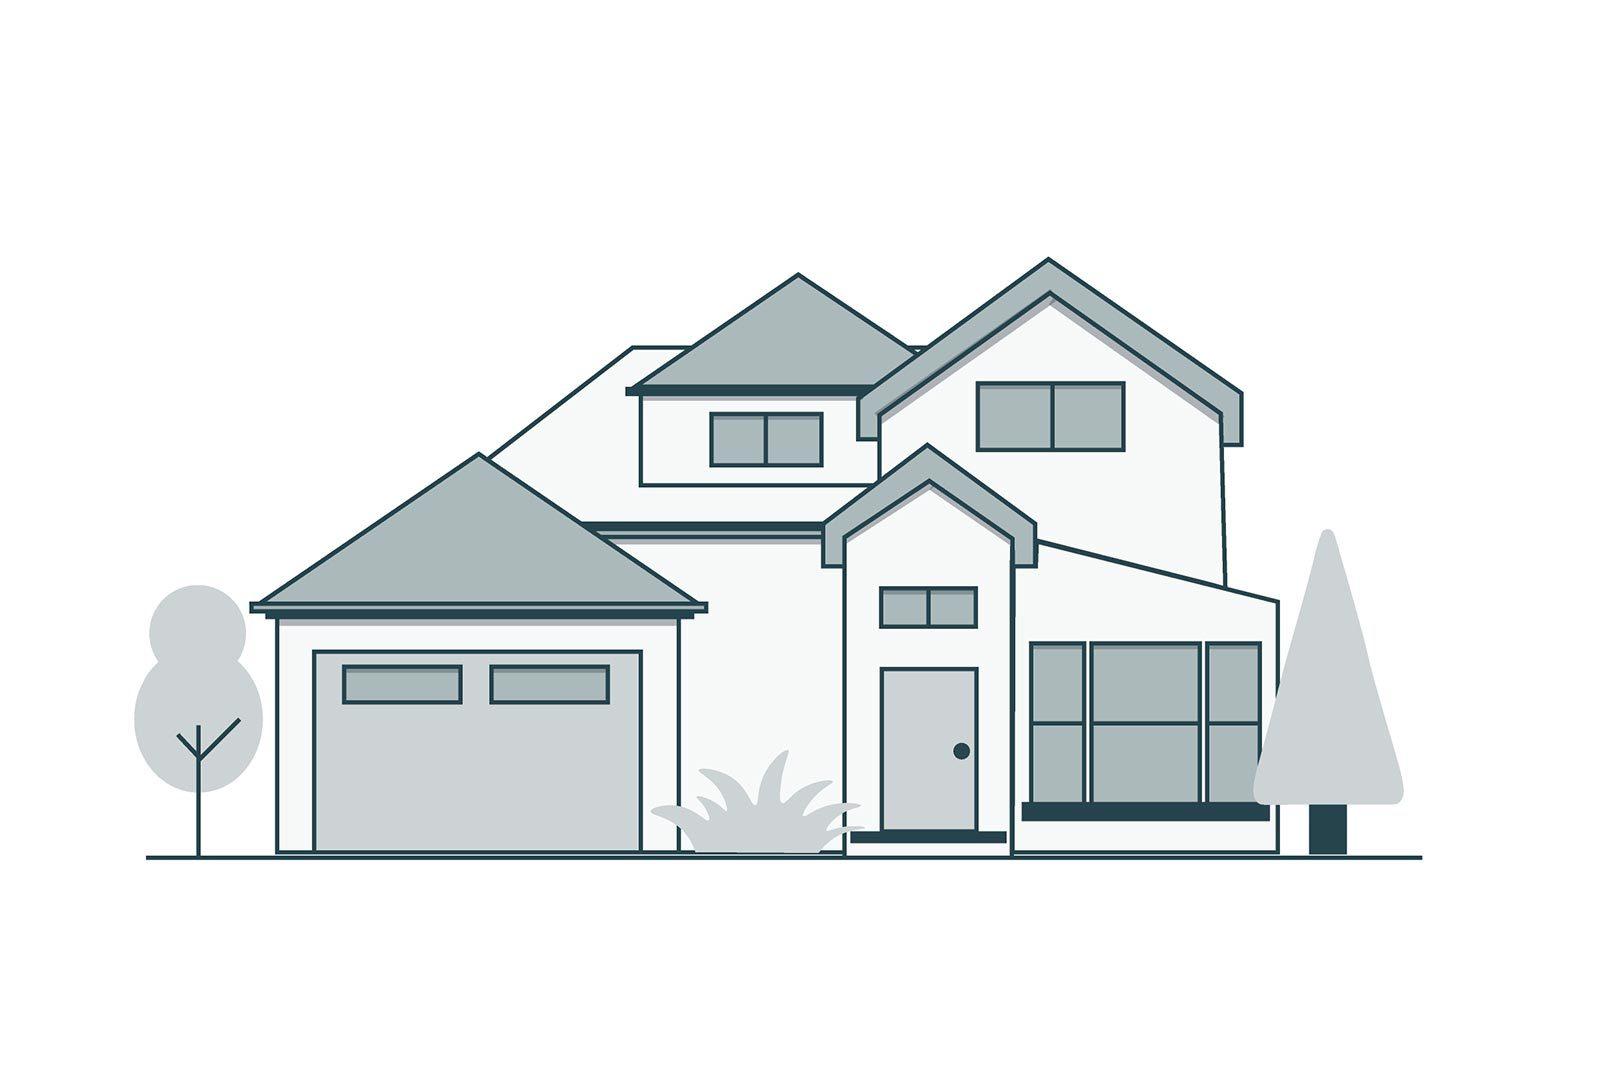 8289 Wightman Ave Fair Oaks, CA 95628